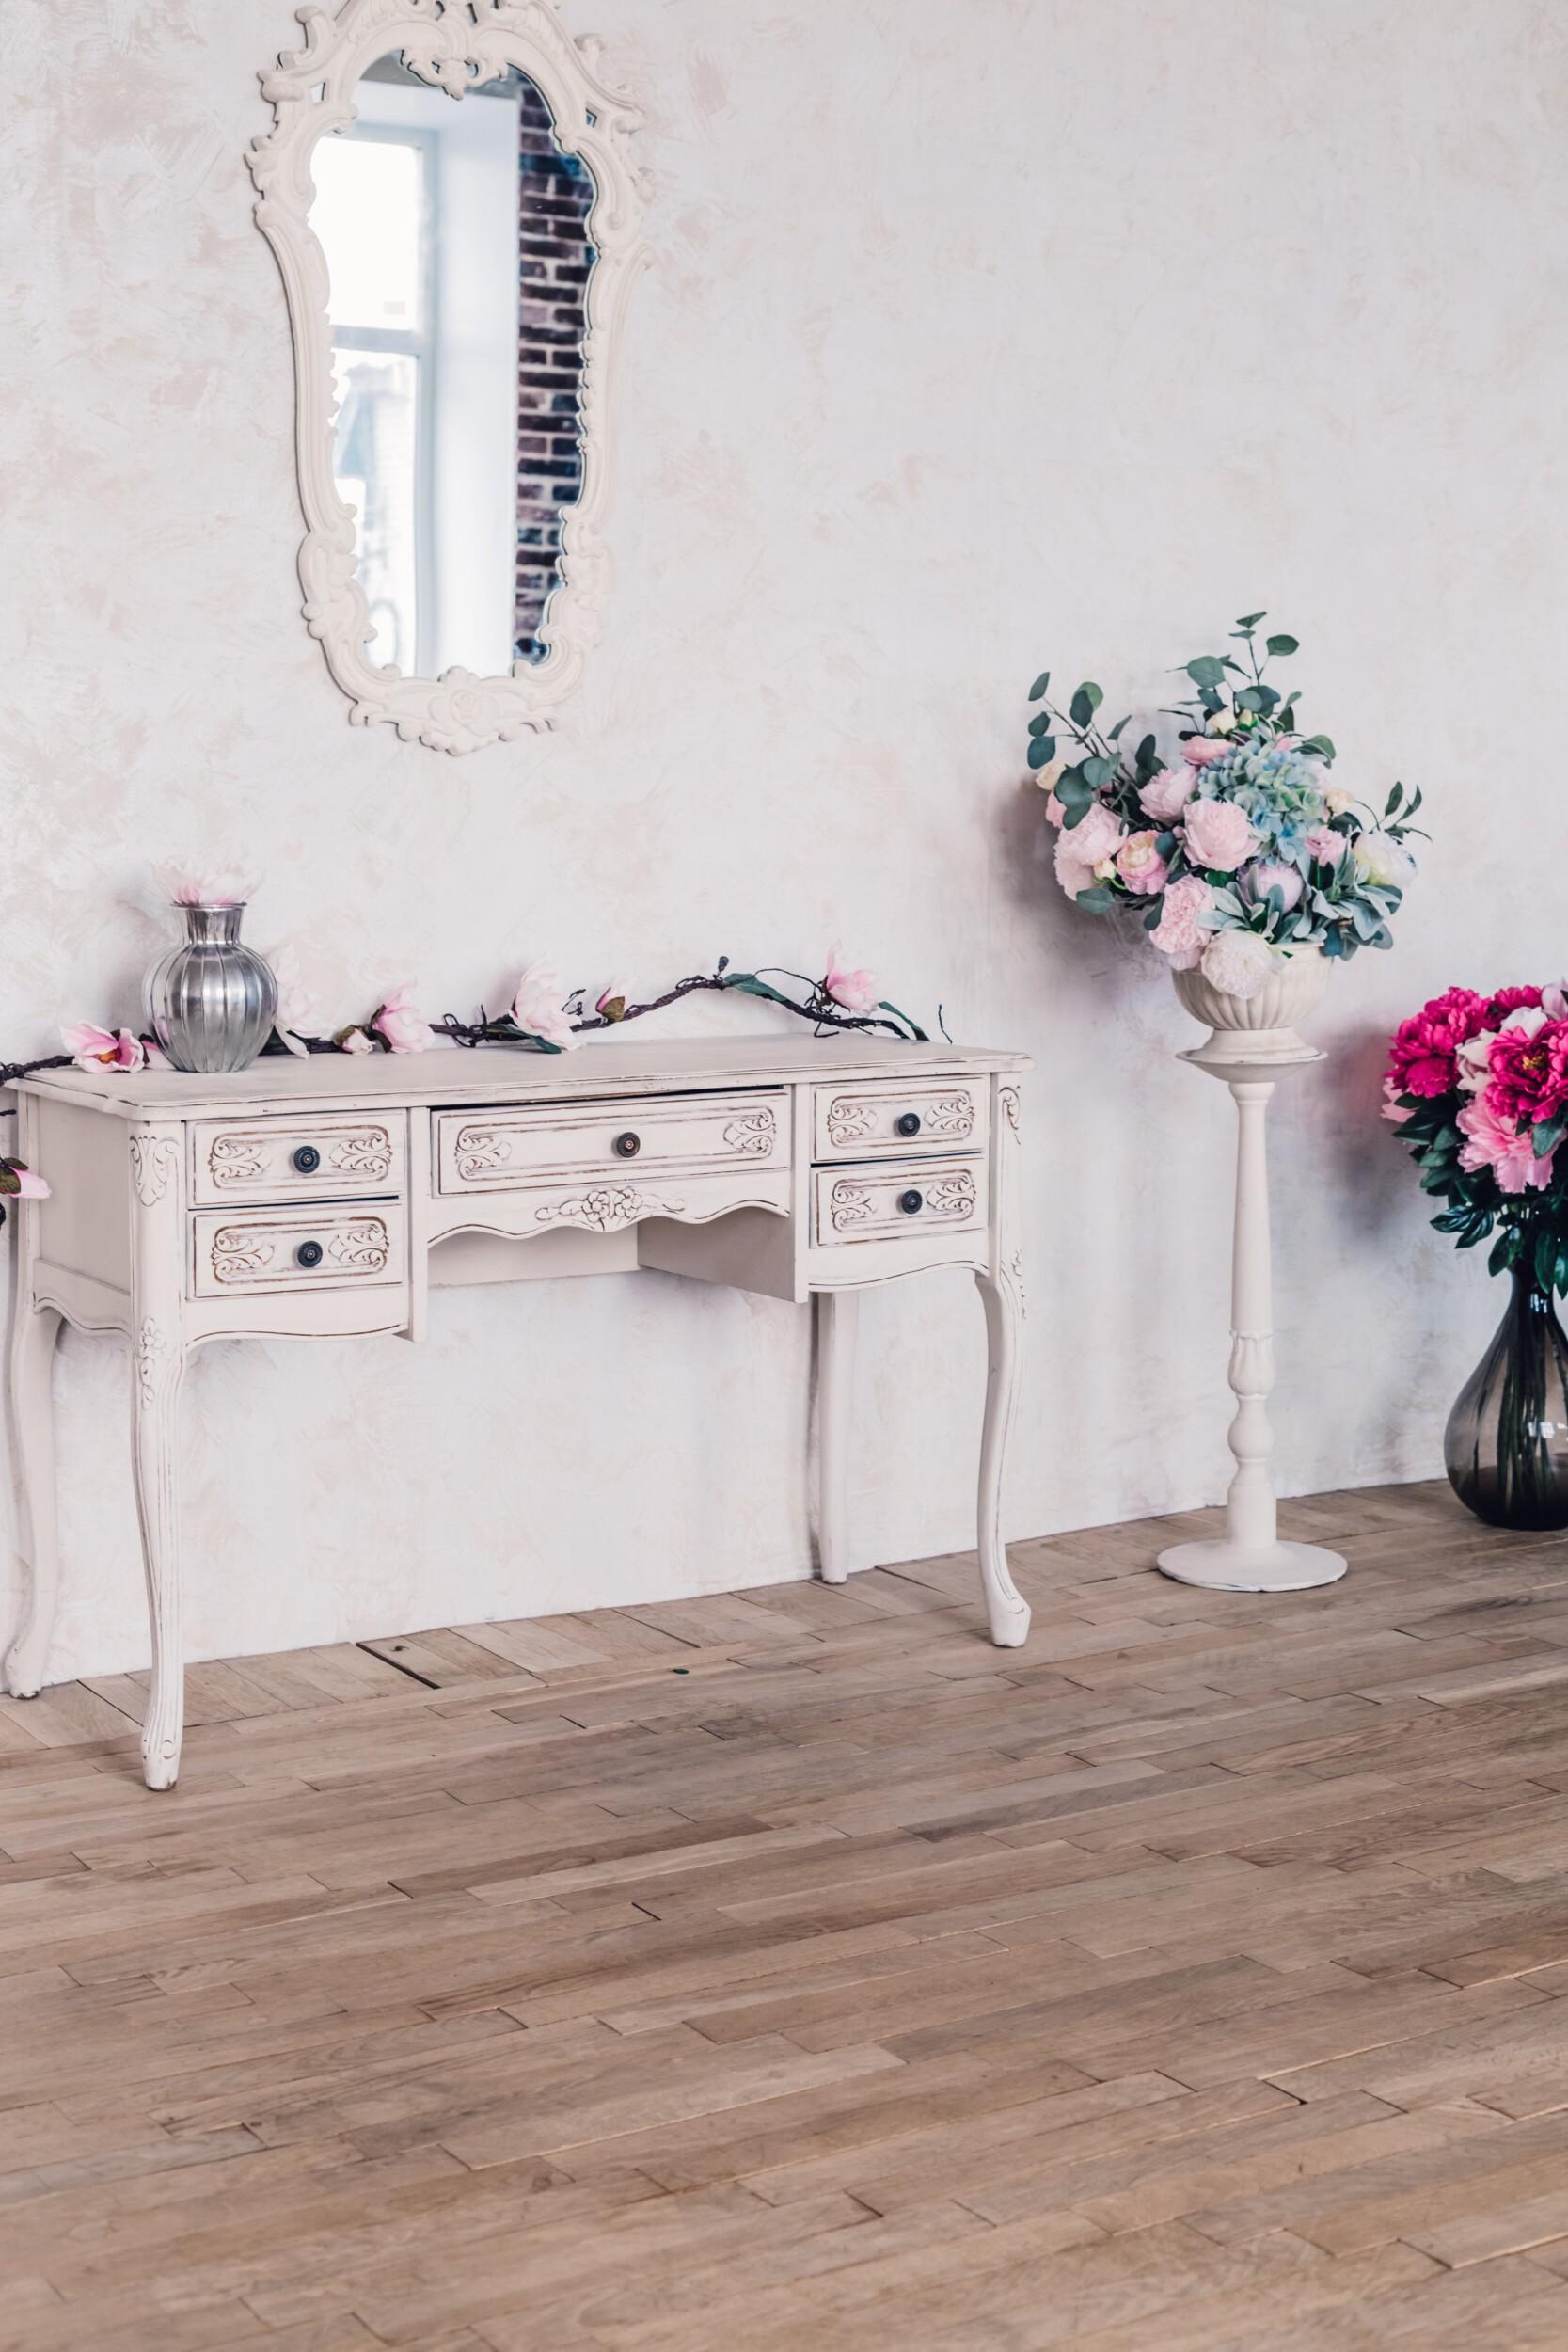 Vintage wedding decor interior with flowers